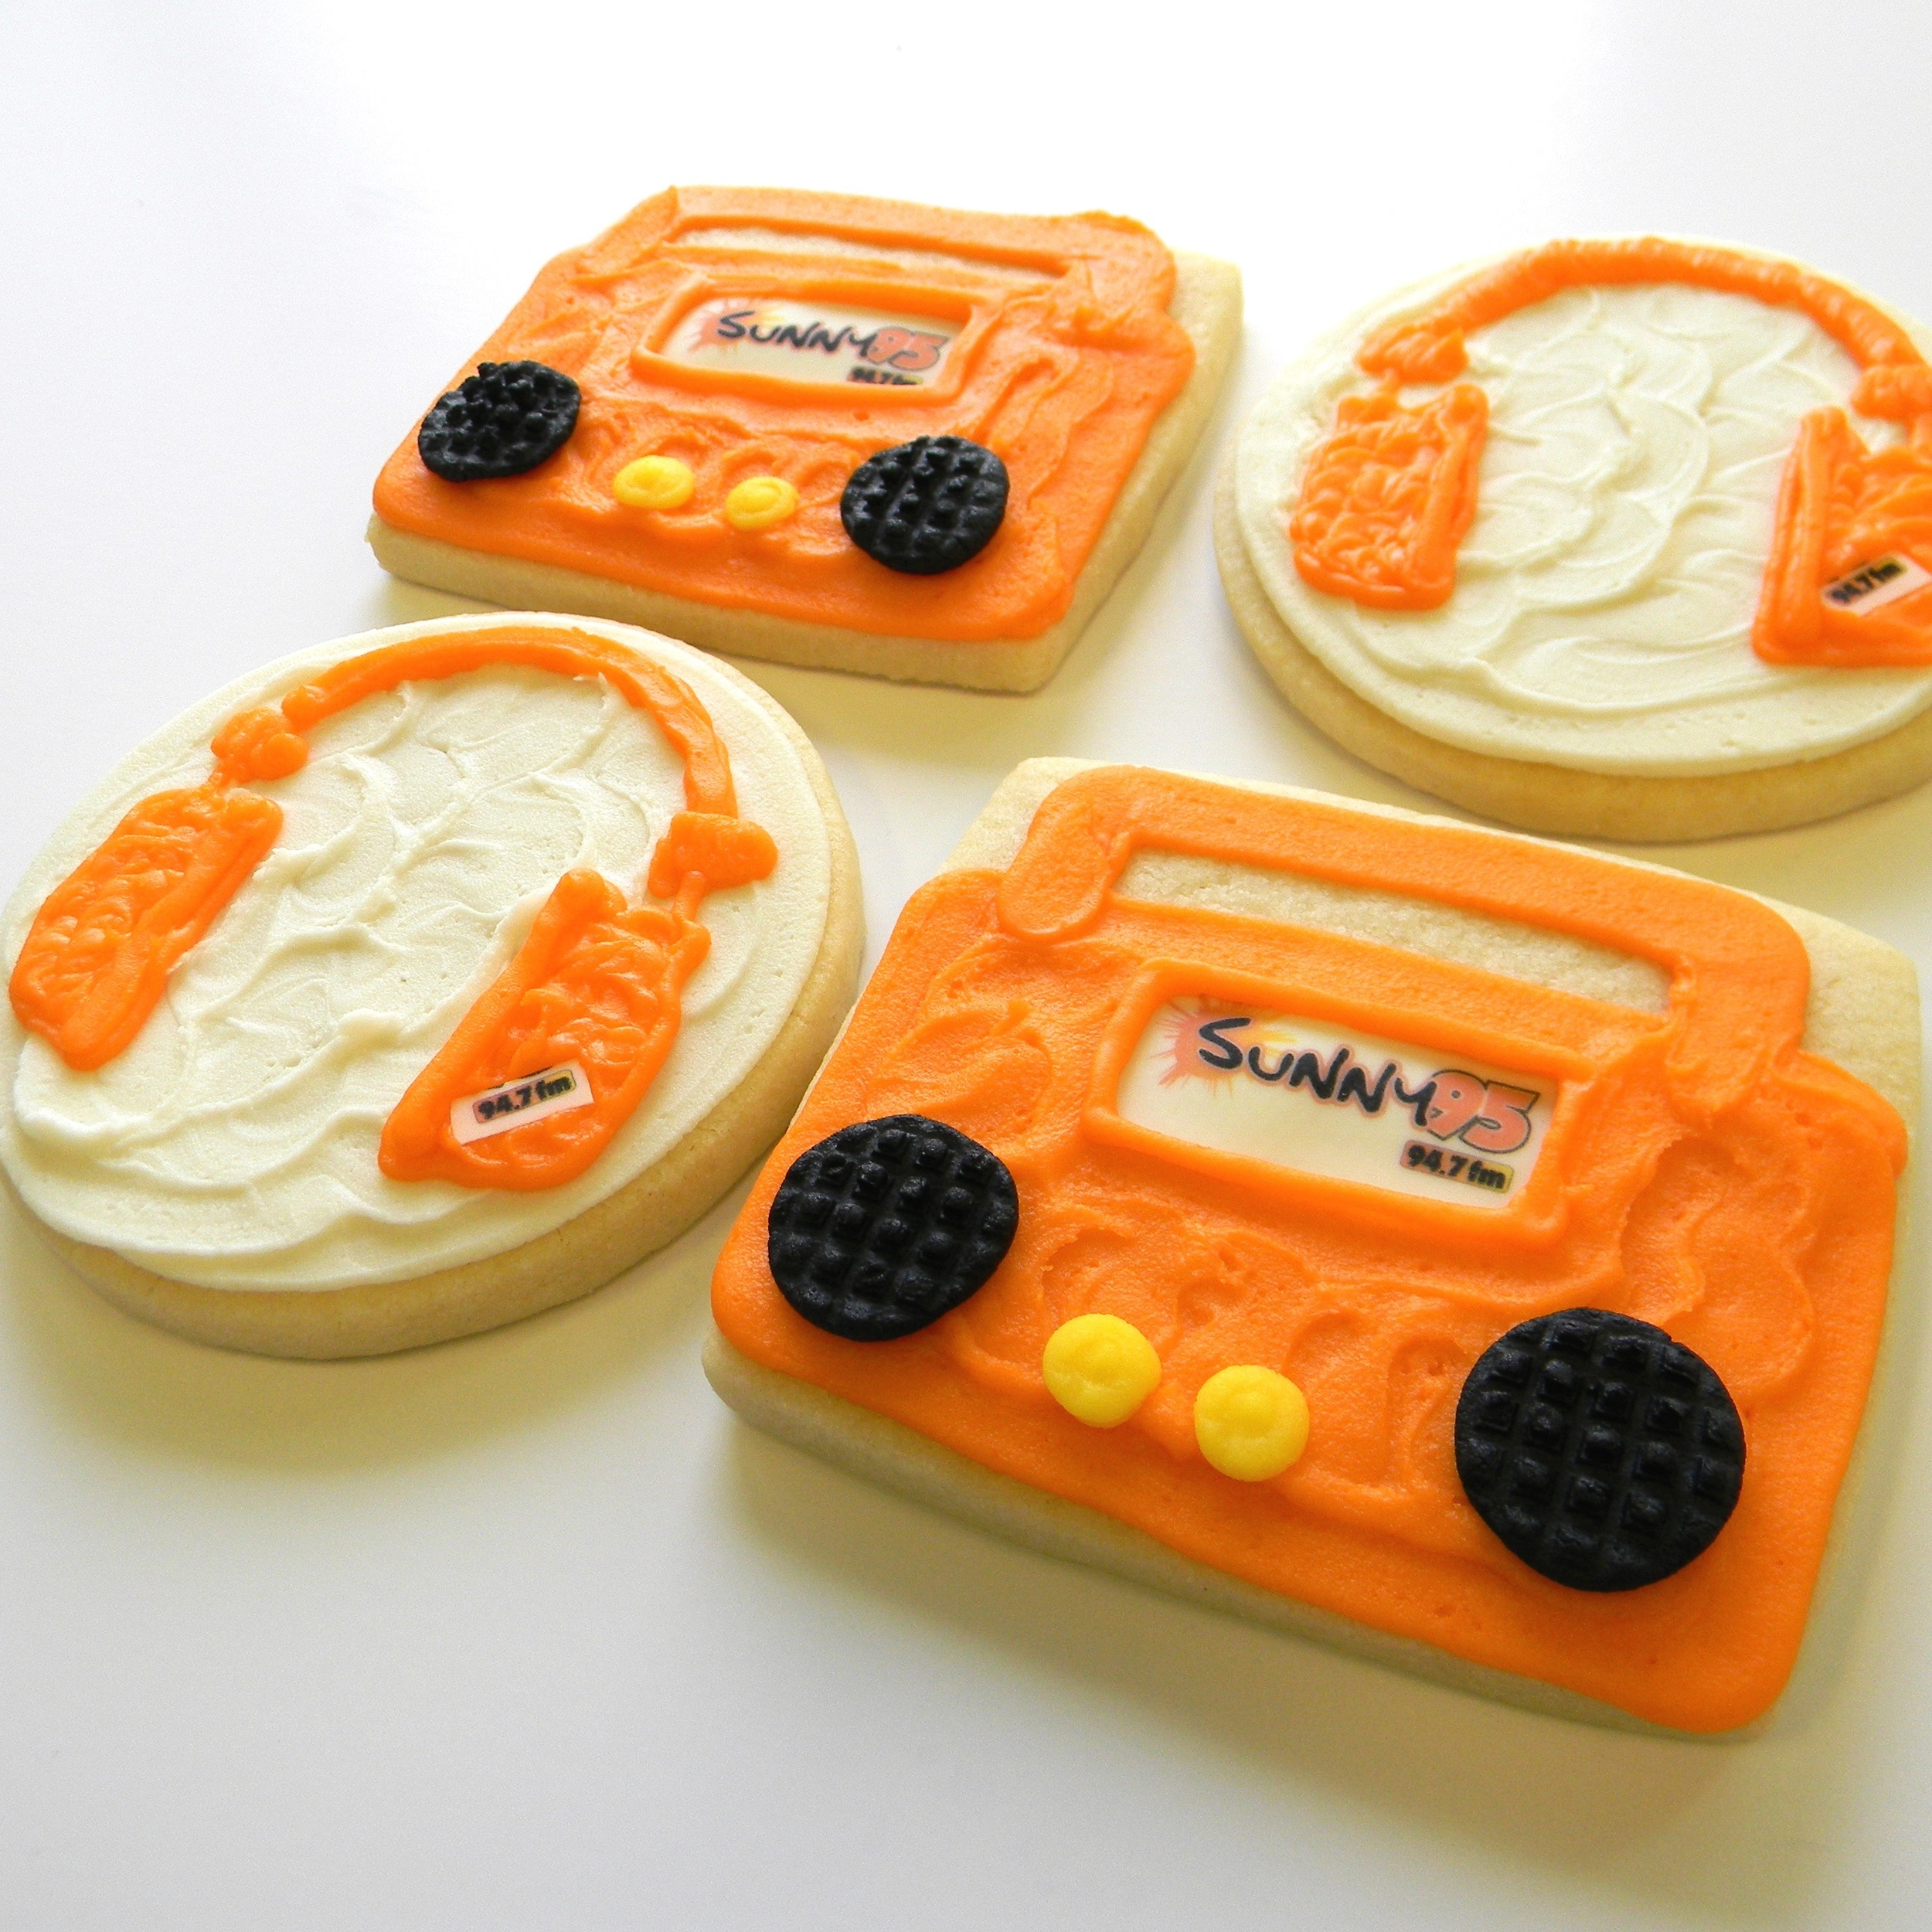 Sunny.95.Cookies.jpg